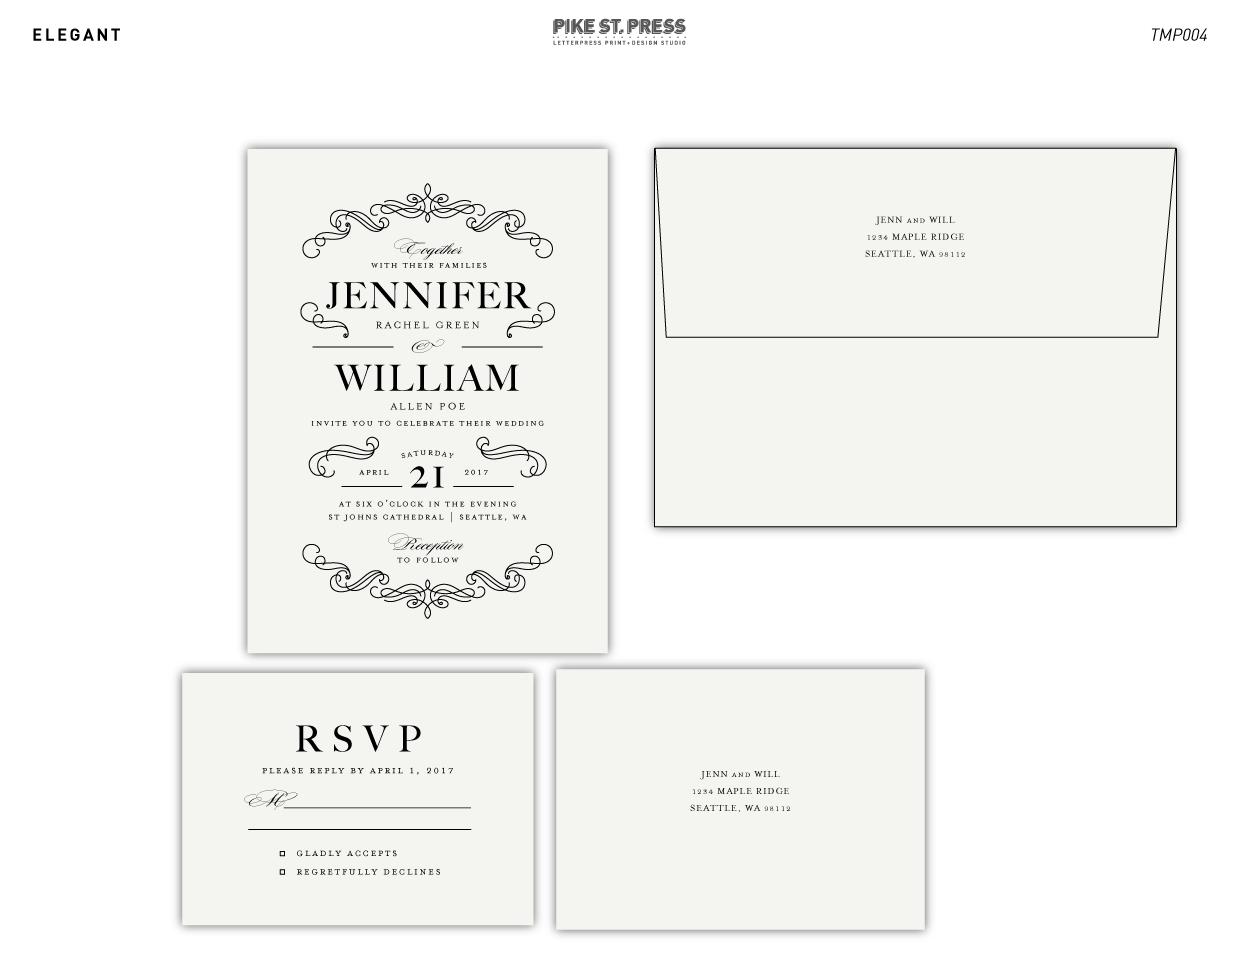 Letterpress Printing Wedding Invitations: TMP004 Wedding Invitation